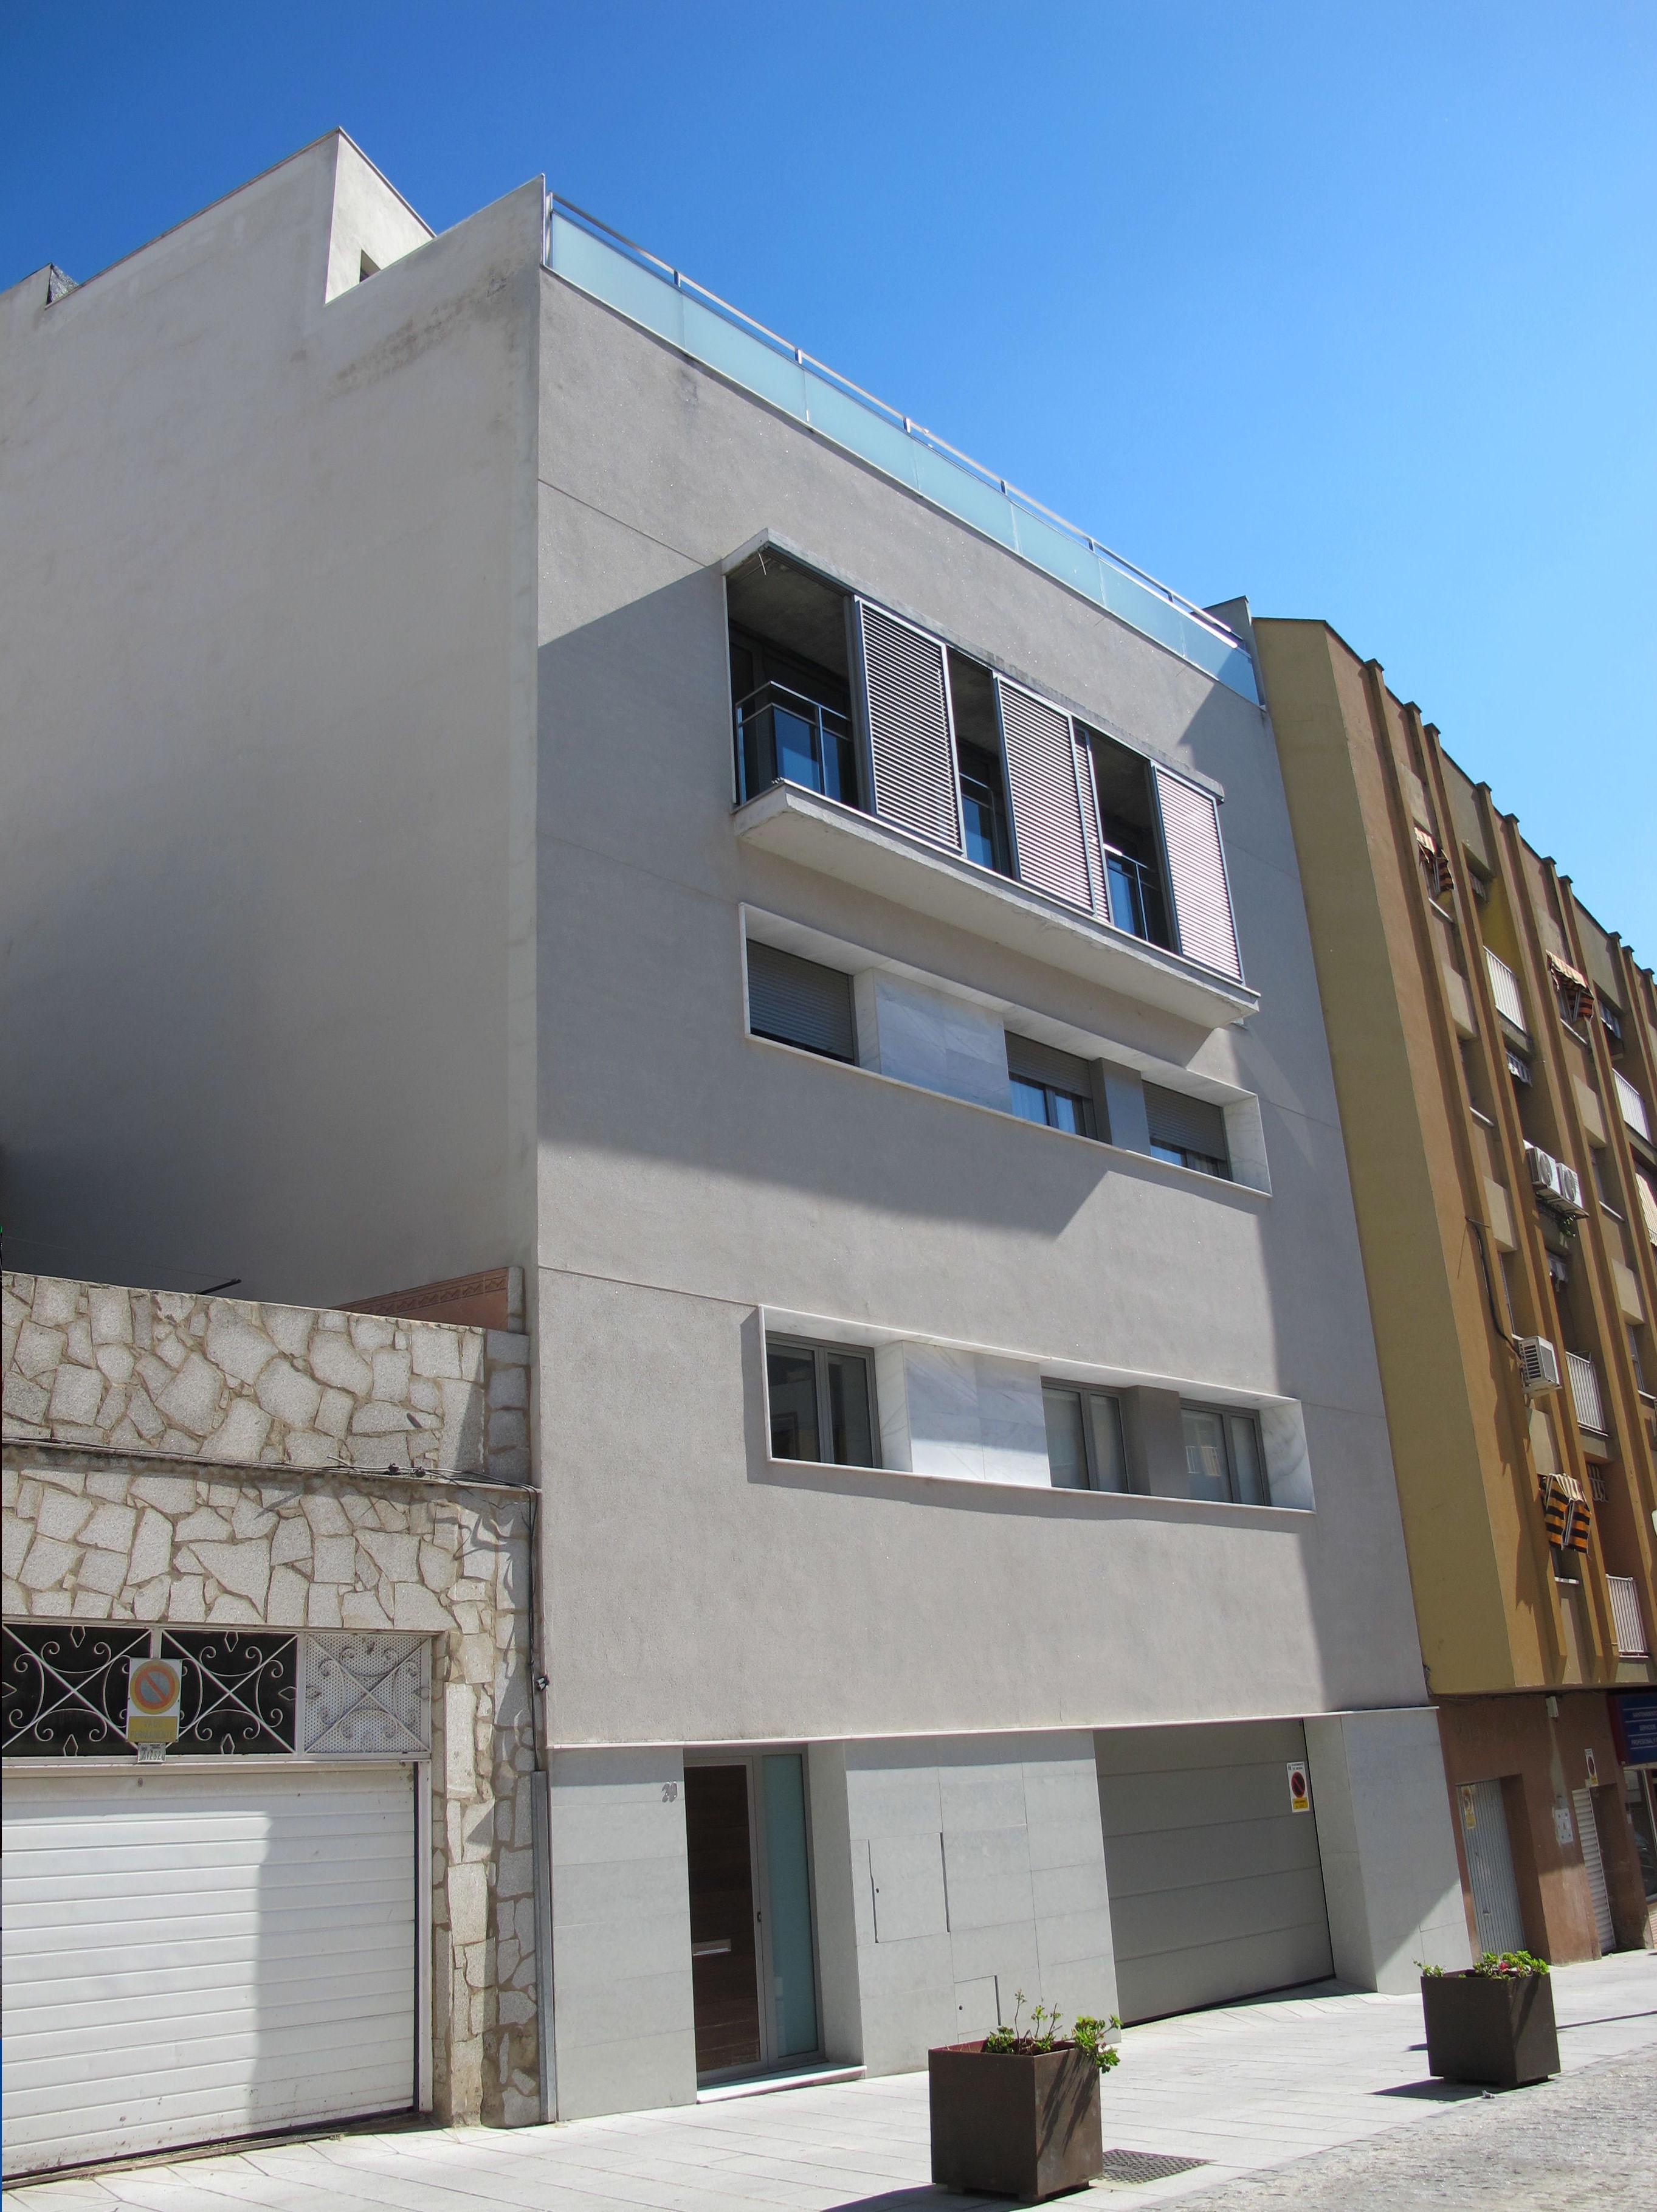 Vivienda en calle Morería. Mérida